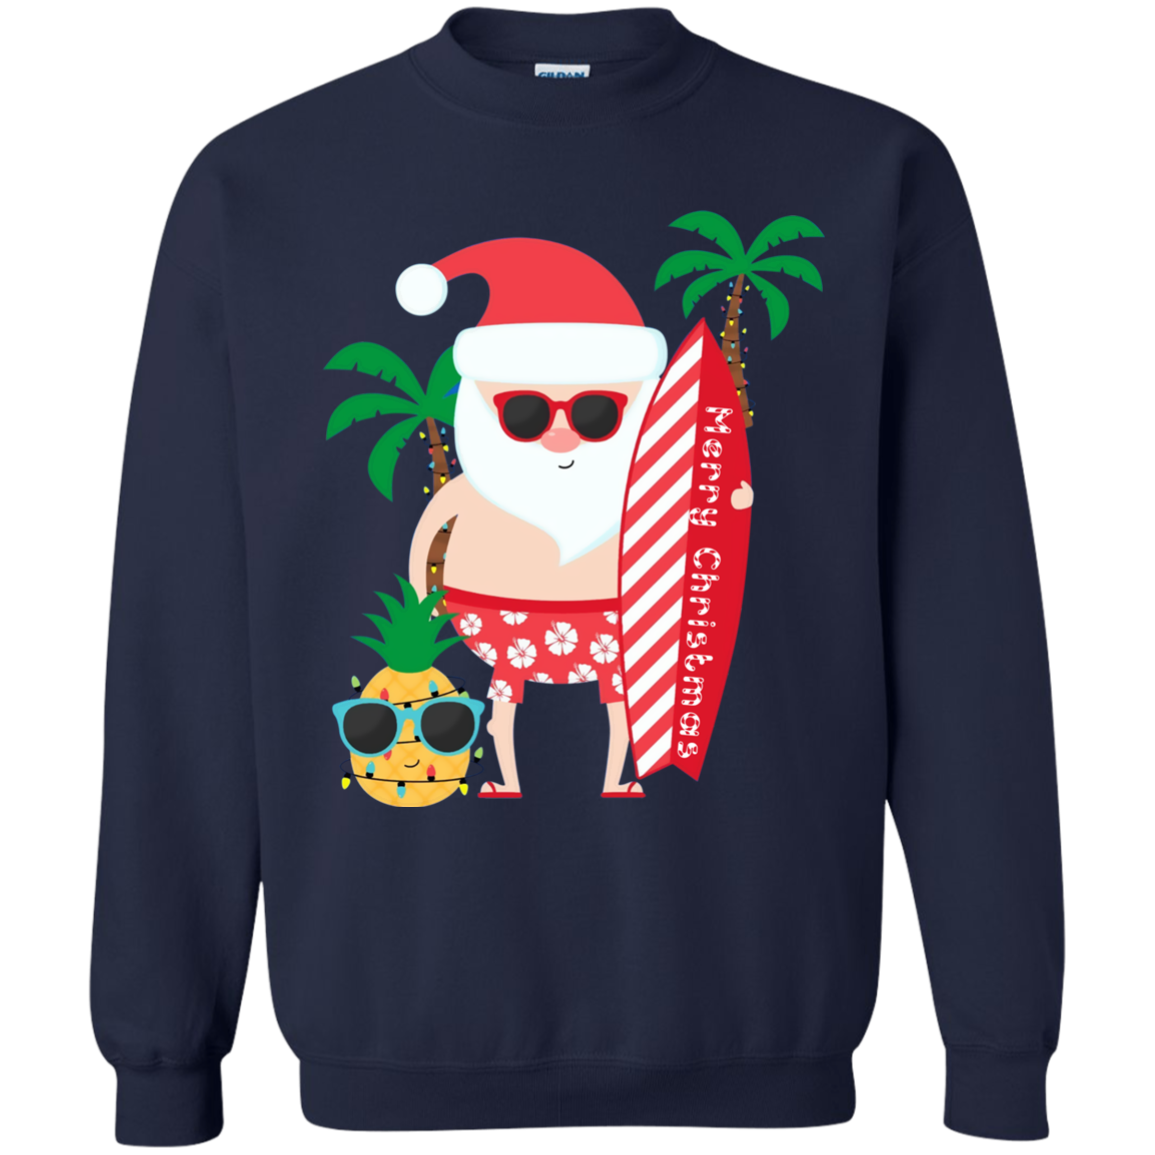 deefd393693 Santa Claus Surfing Hawaiian Shirt Summer Christmas Outfit G180 Gildan  Crewneck Pullover Sweatshirt 8 oz.